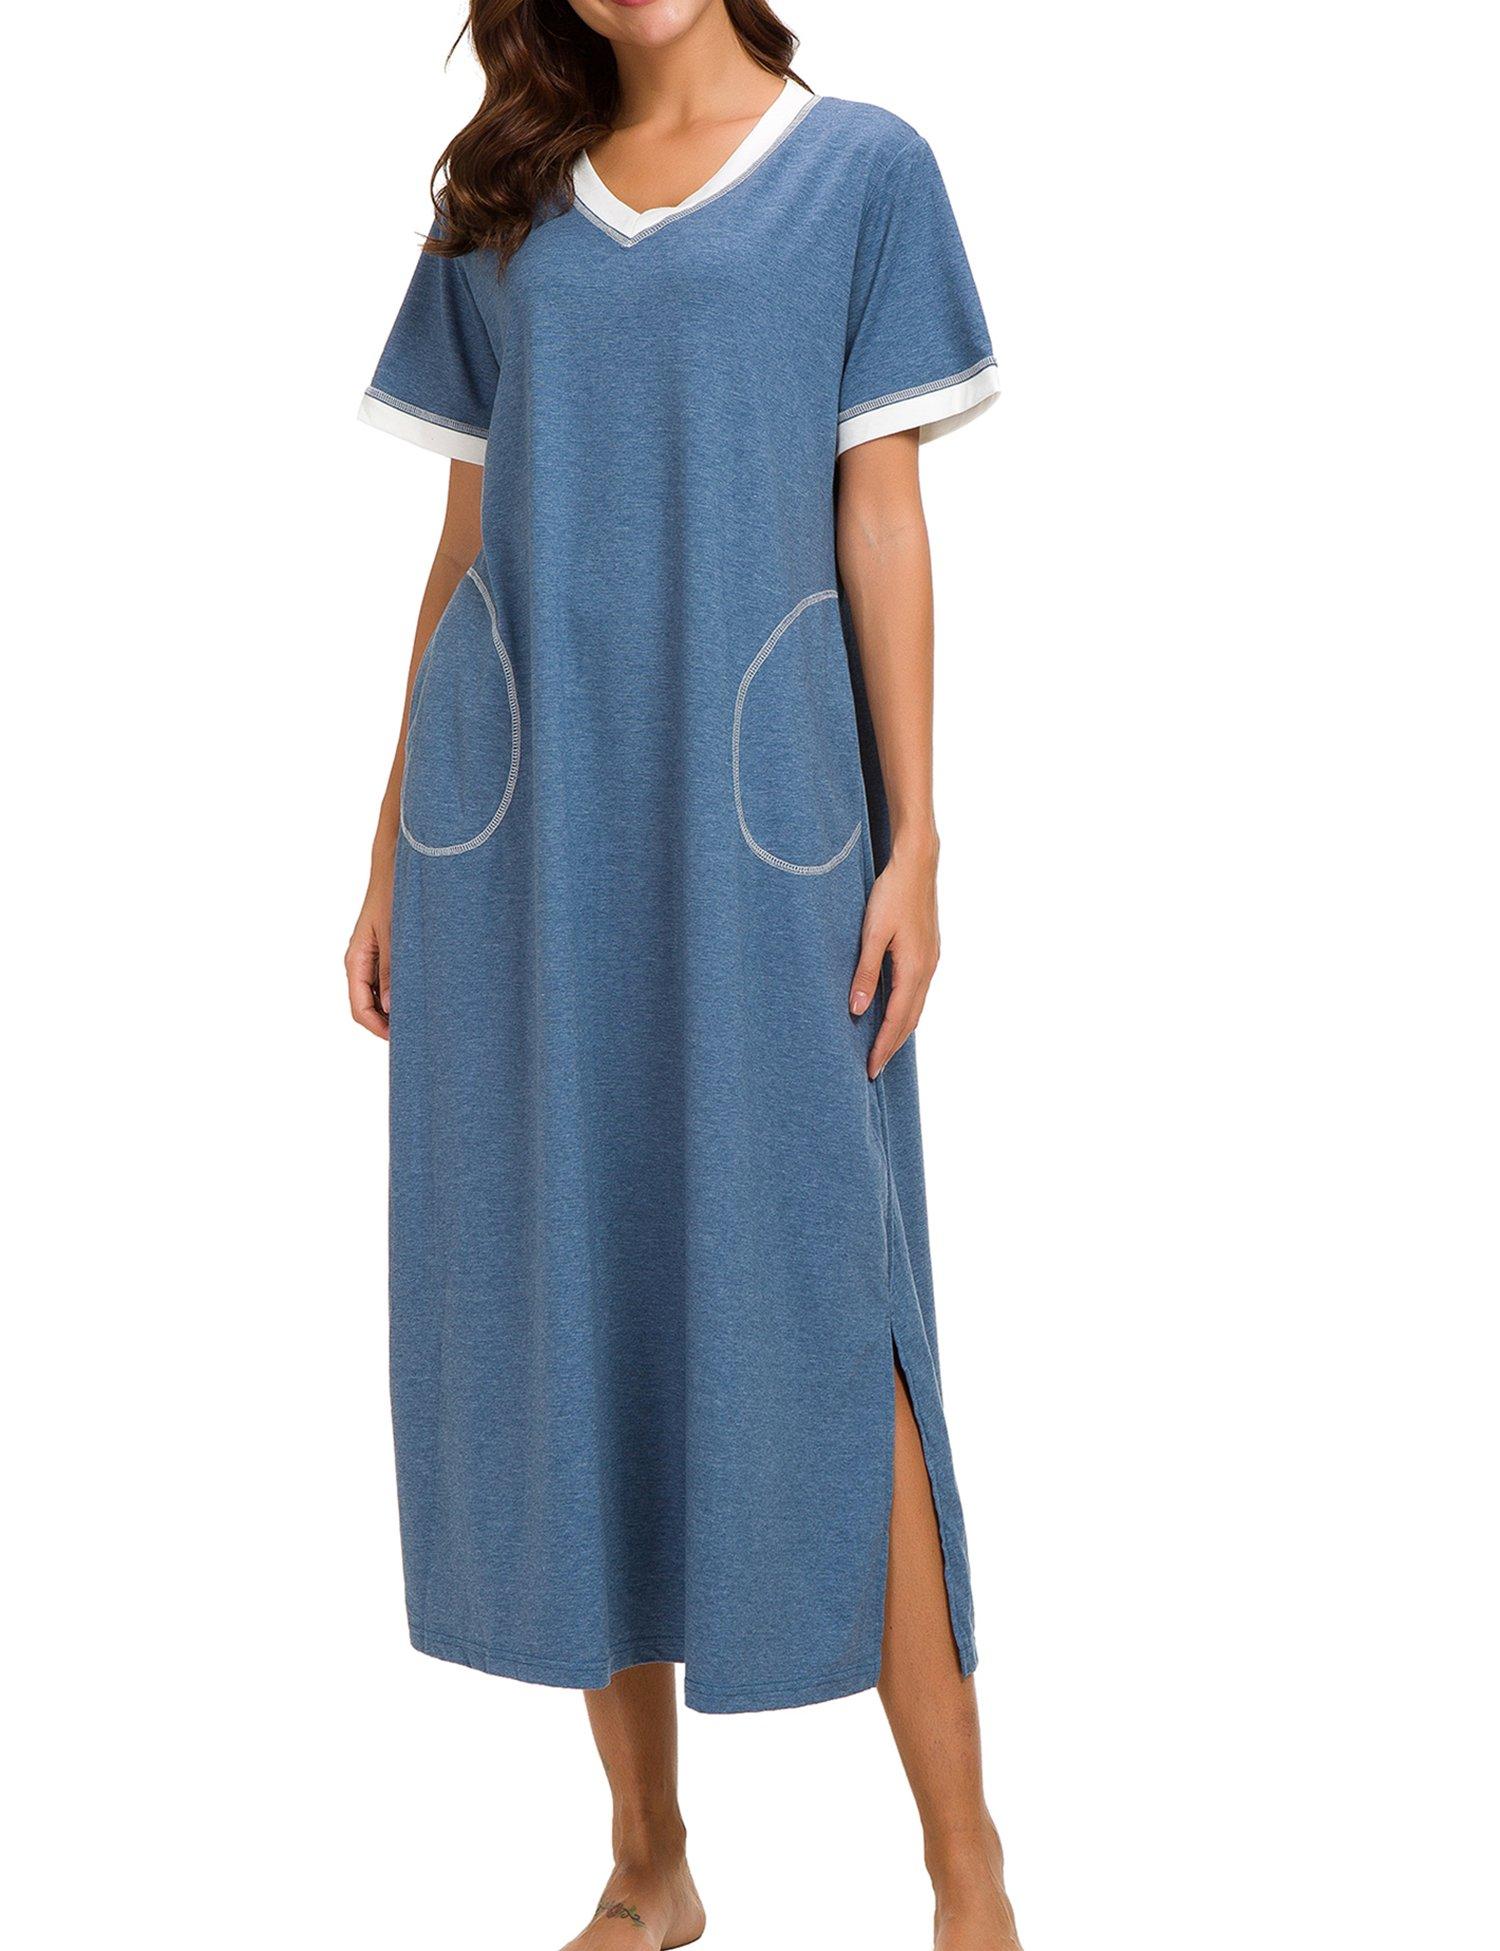 Dolay Short Sleeve Nightgown Cotton Sleep Dress for Women Full Sleep T Shirts (Blue, Small)